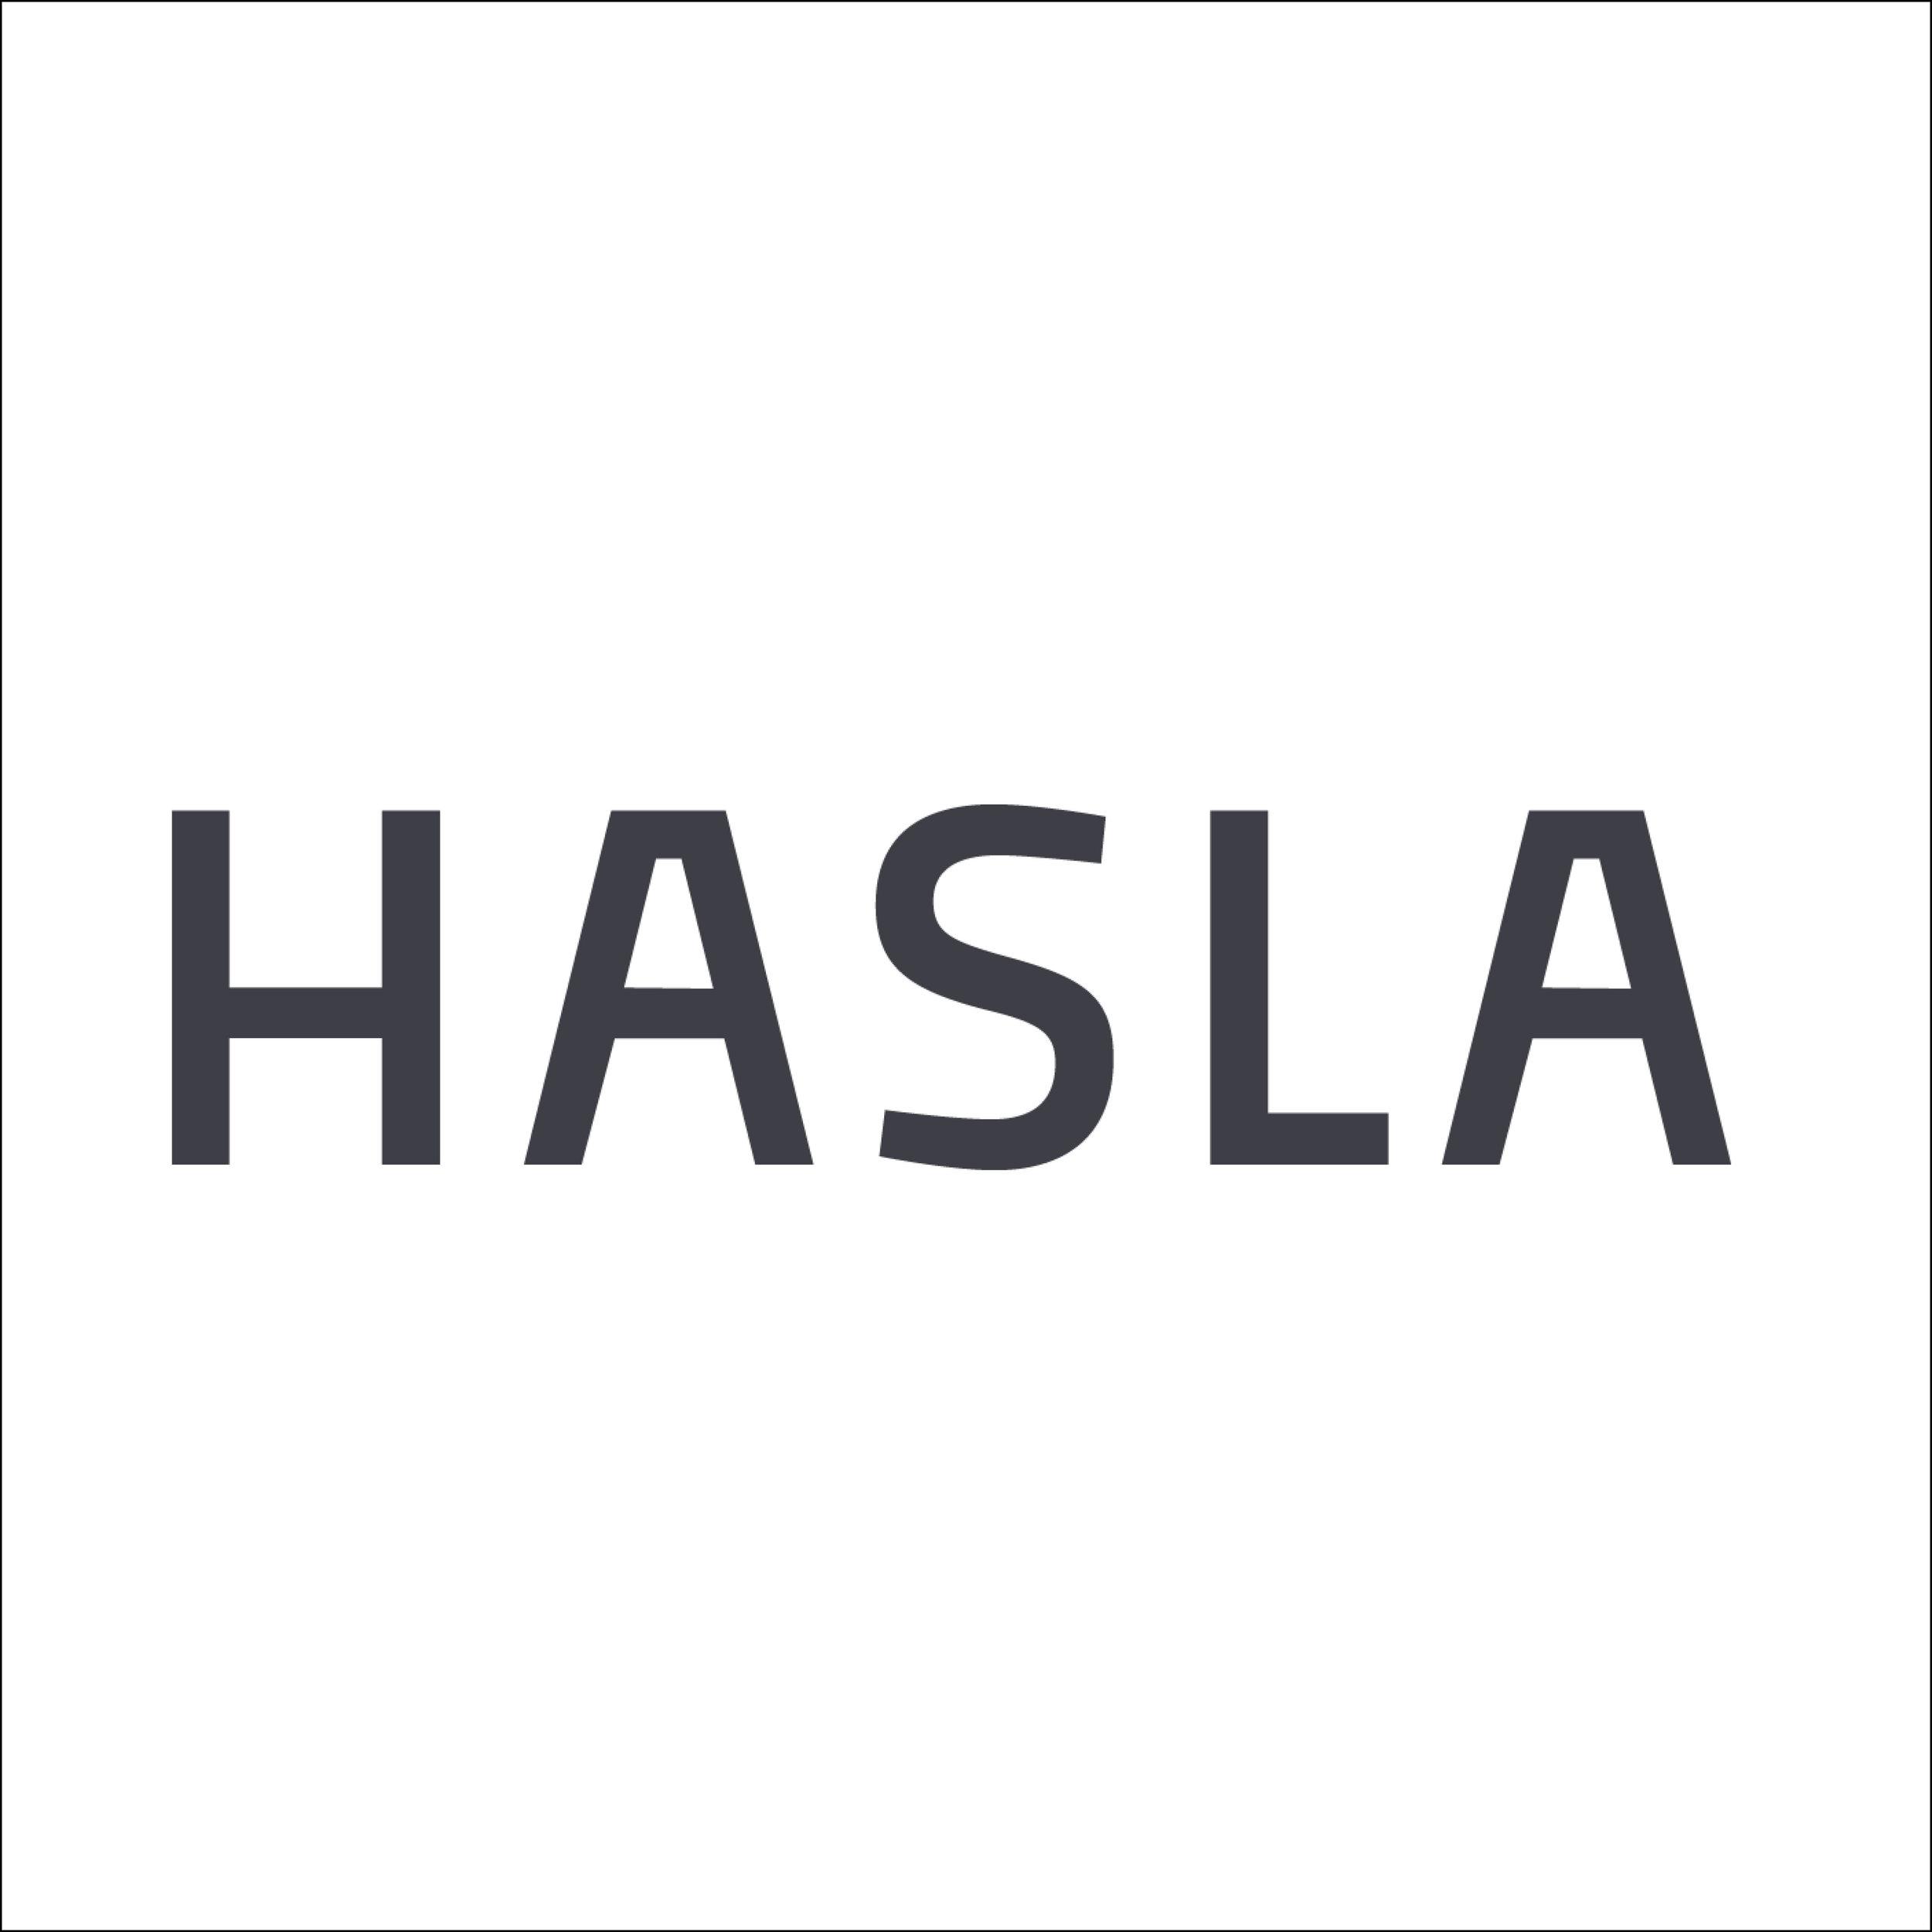 hasla2.jpg